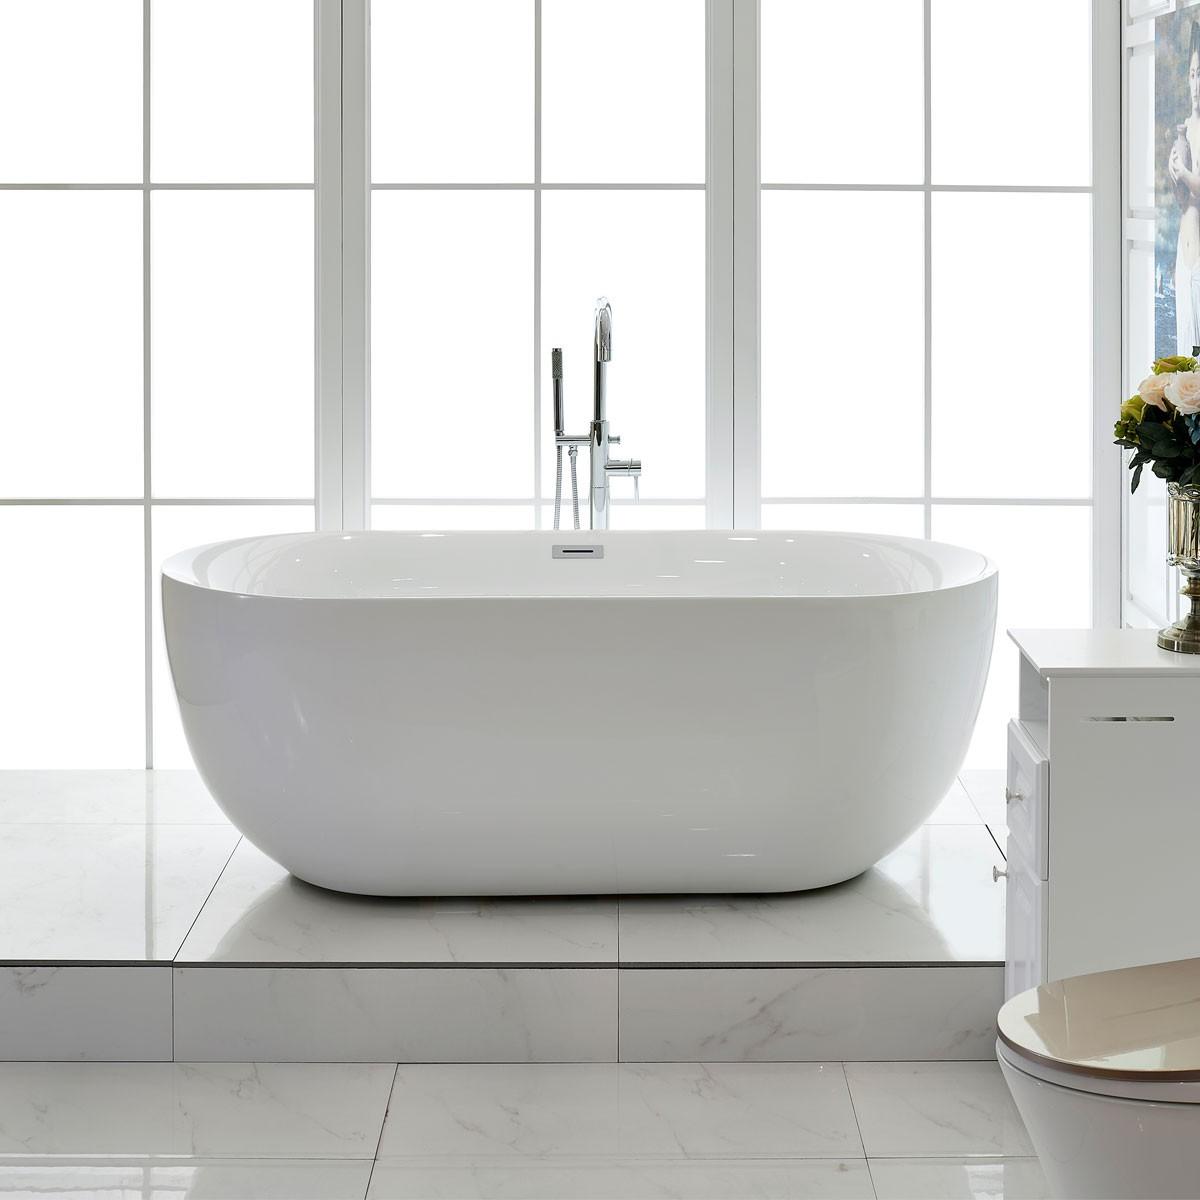 67 In Freestanding Bathtub - Acrylic Pure White (DK-PW-44778)